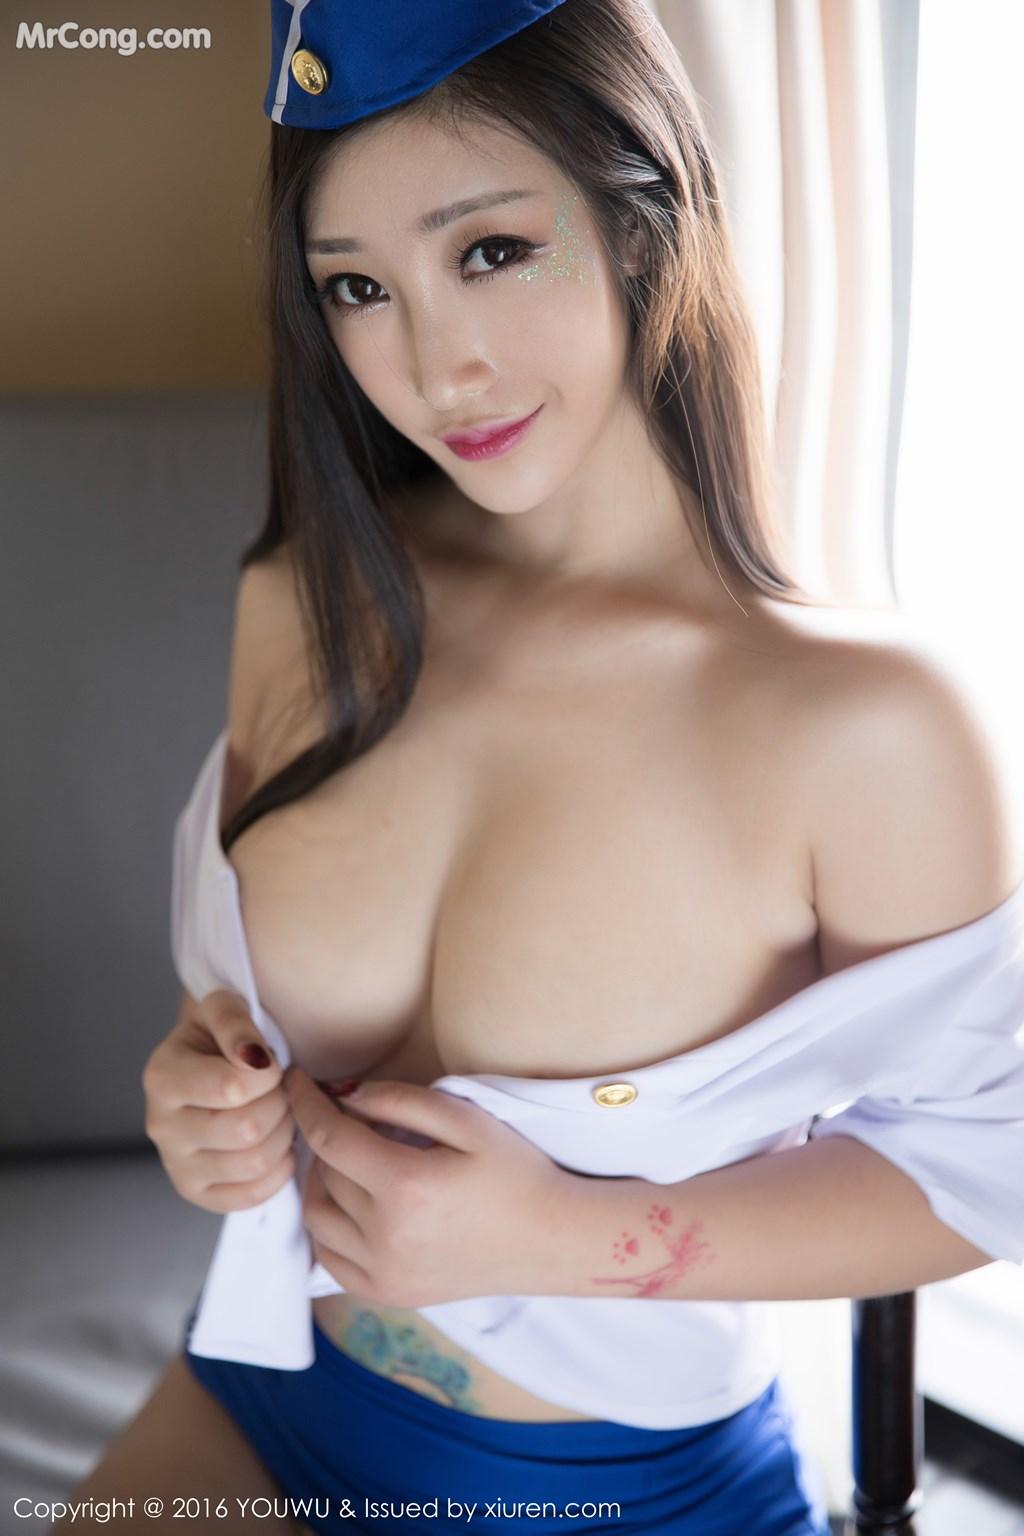 Image YouMi-Vol.239-Daji-Toxic-MrCong.com-042 in post YouMi Vol.239: Người mẫu Daji_Toxic (妲己_Toxic) (46 ảnh)